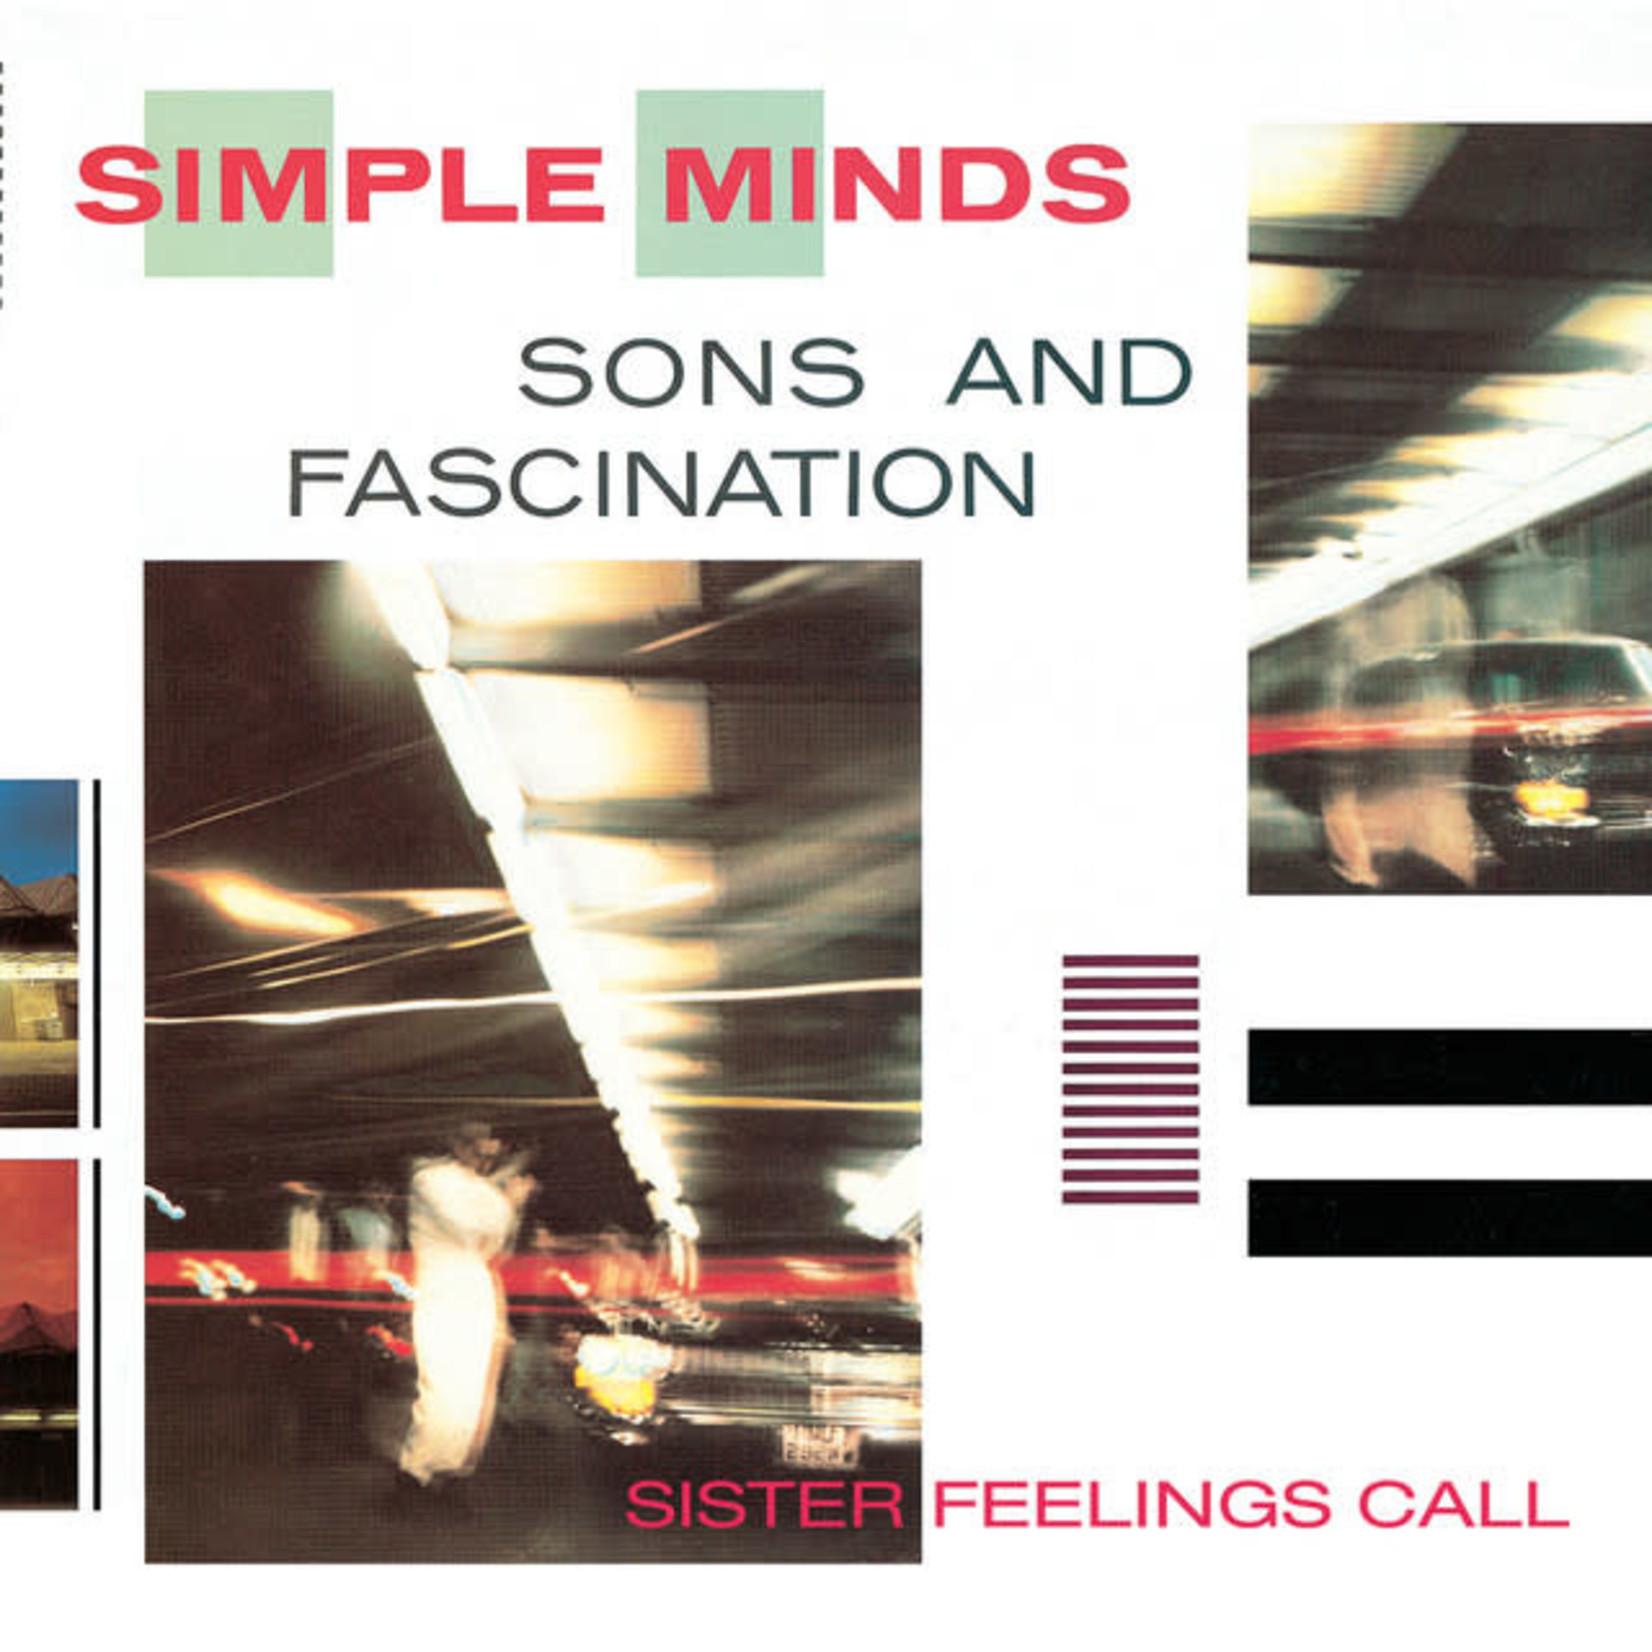 Vinyl Simple Minds - Sister Feelings Call